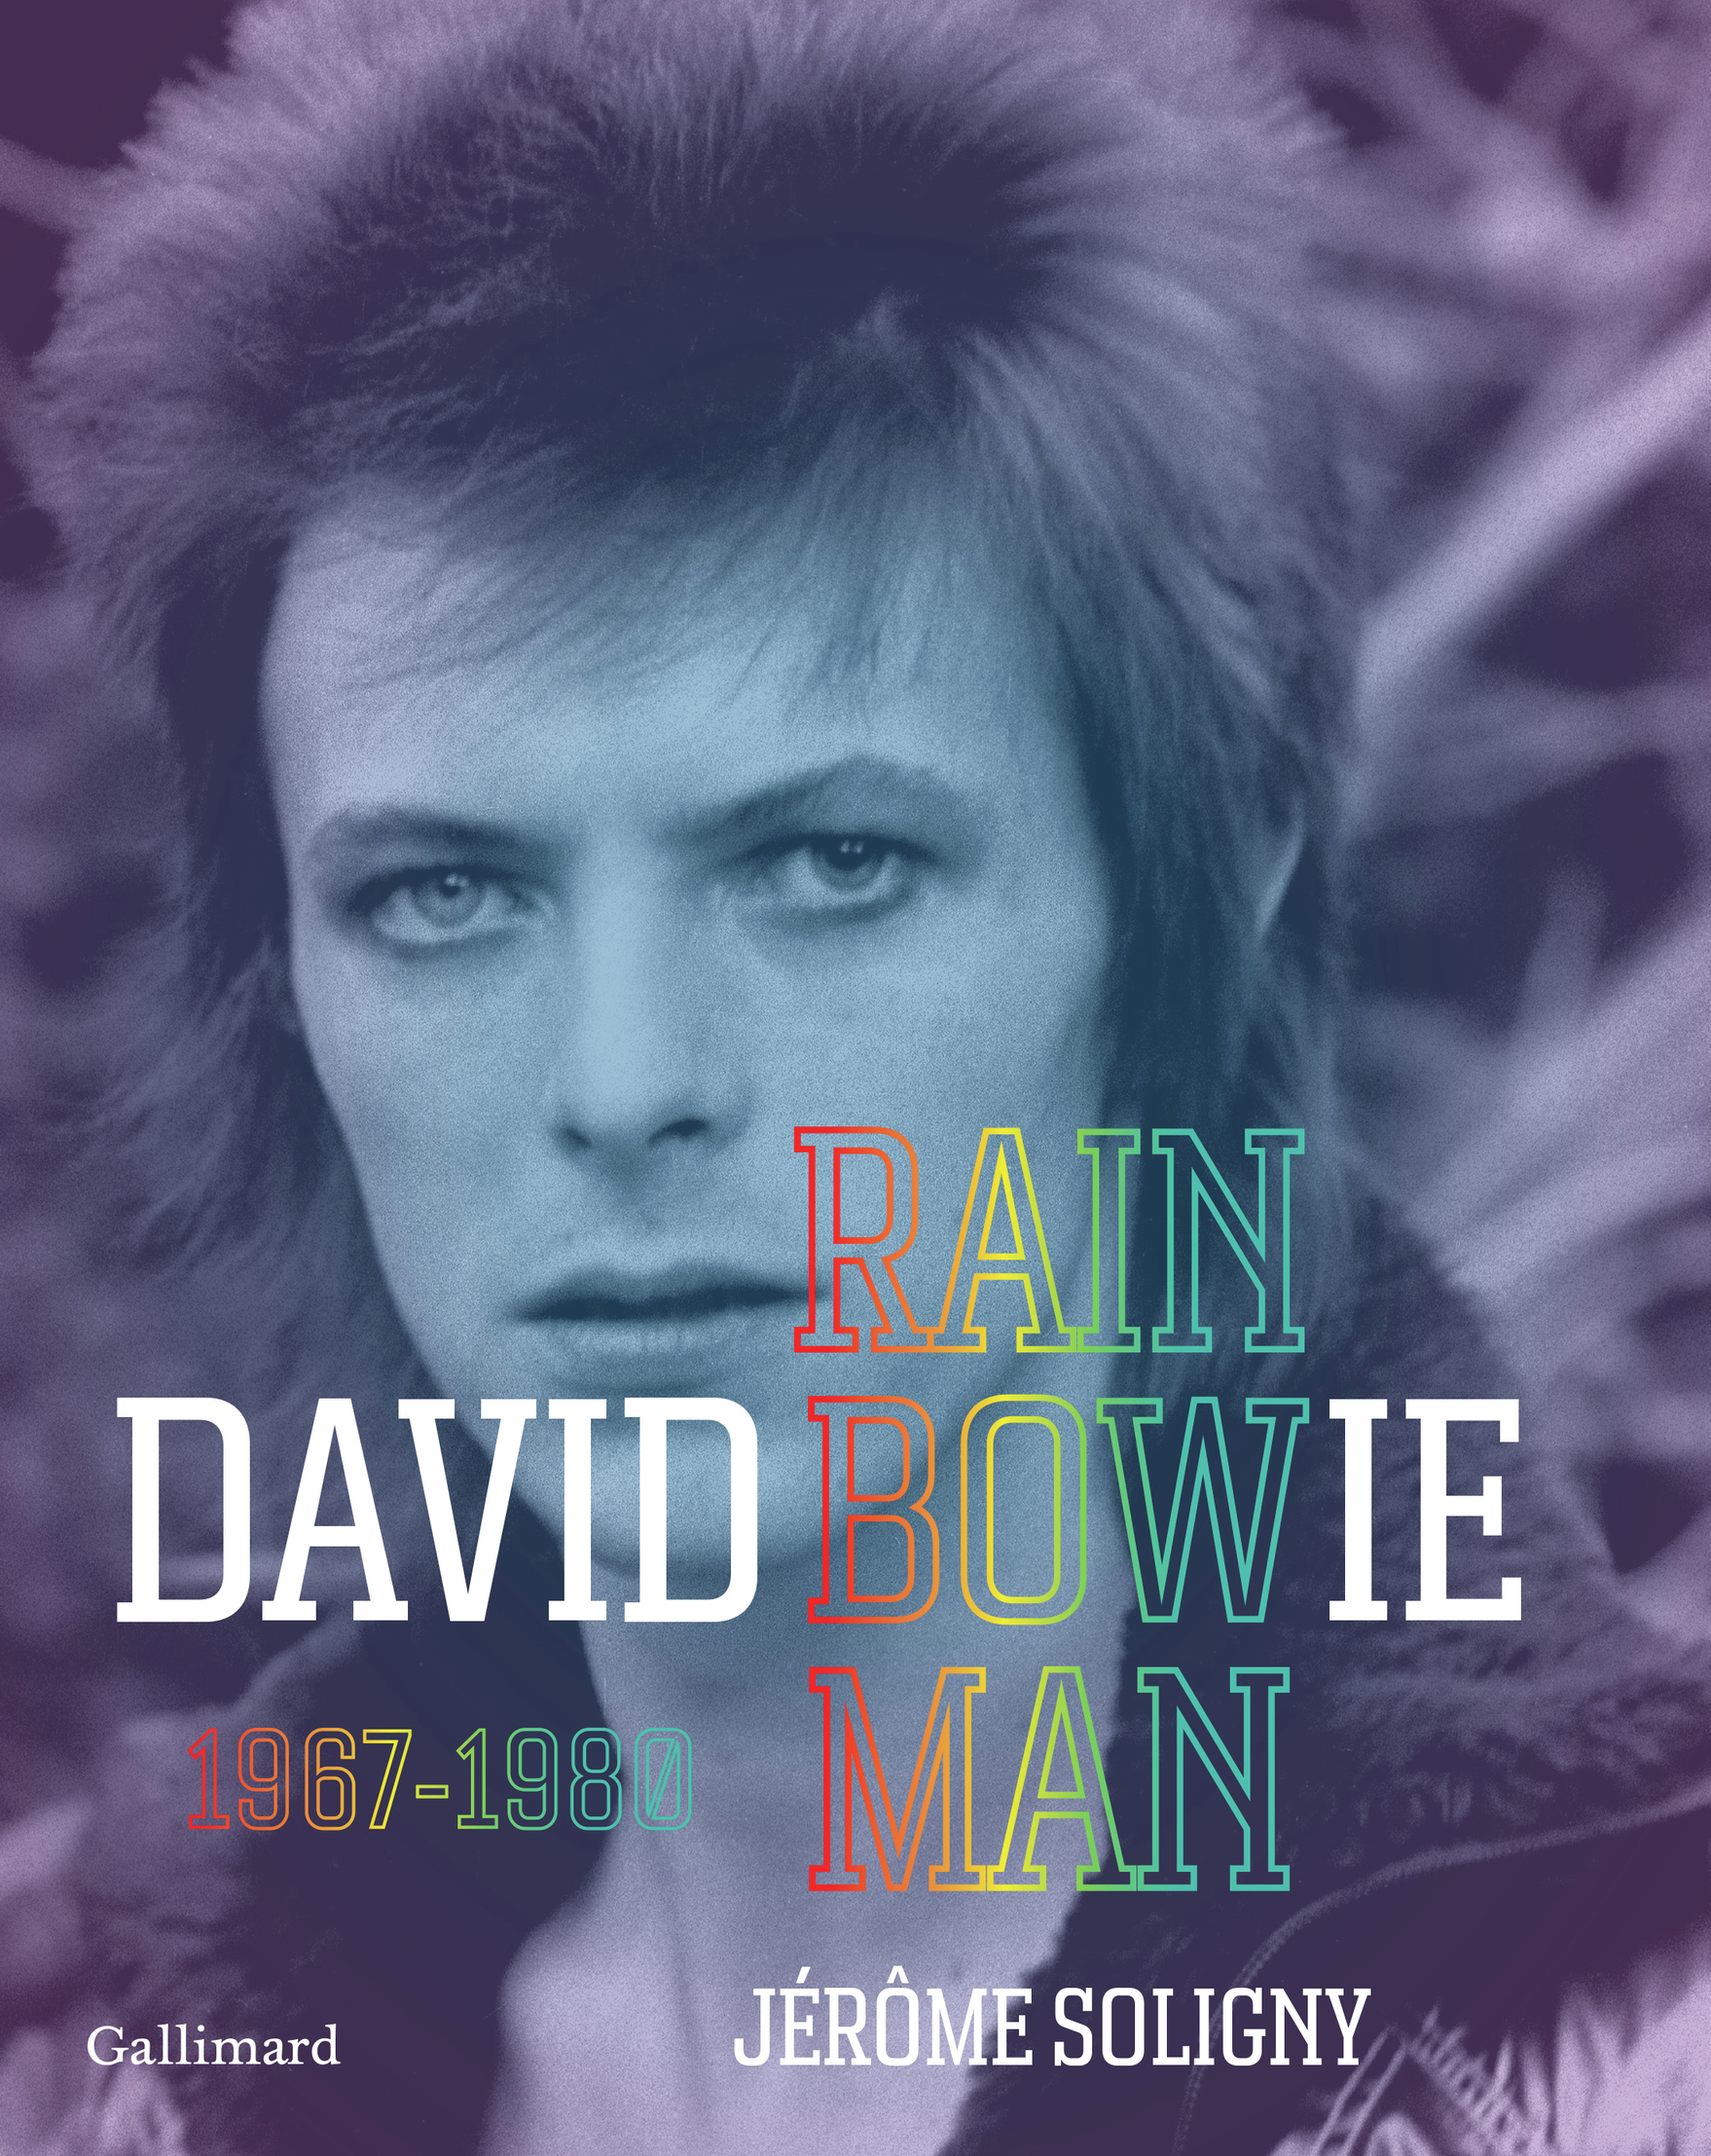 DAVID BOWIE - RAINBOWMAN (1967-1980)